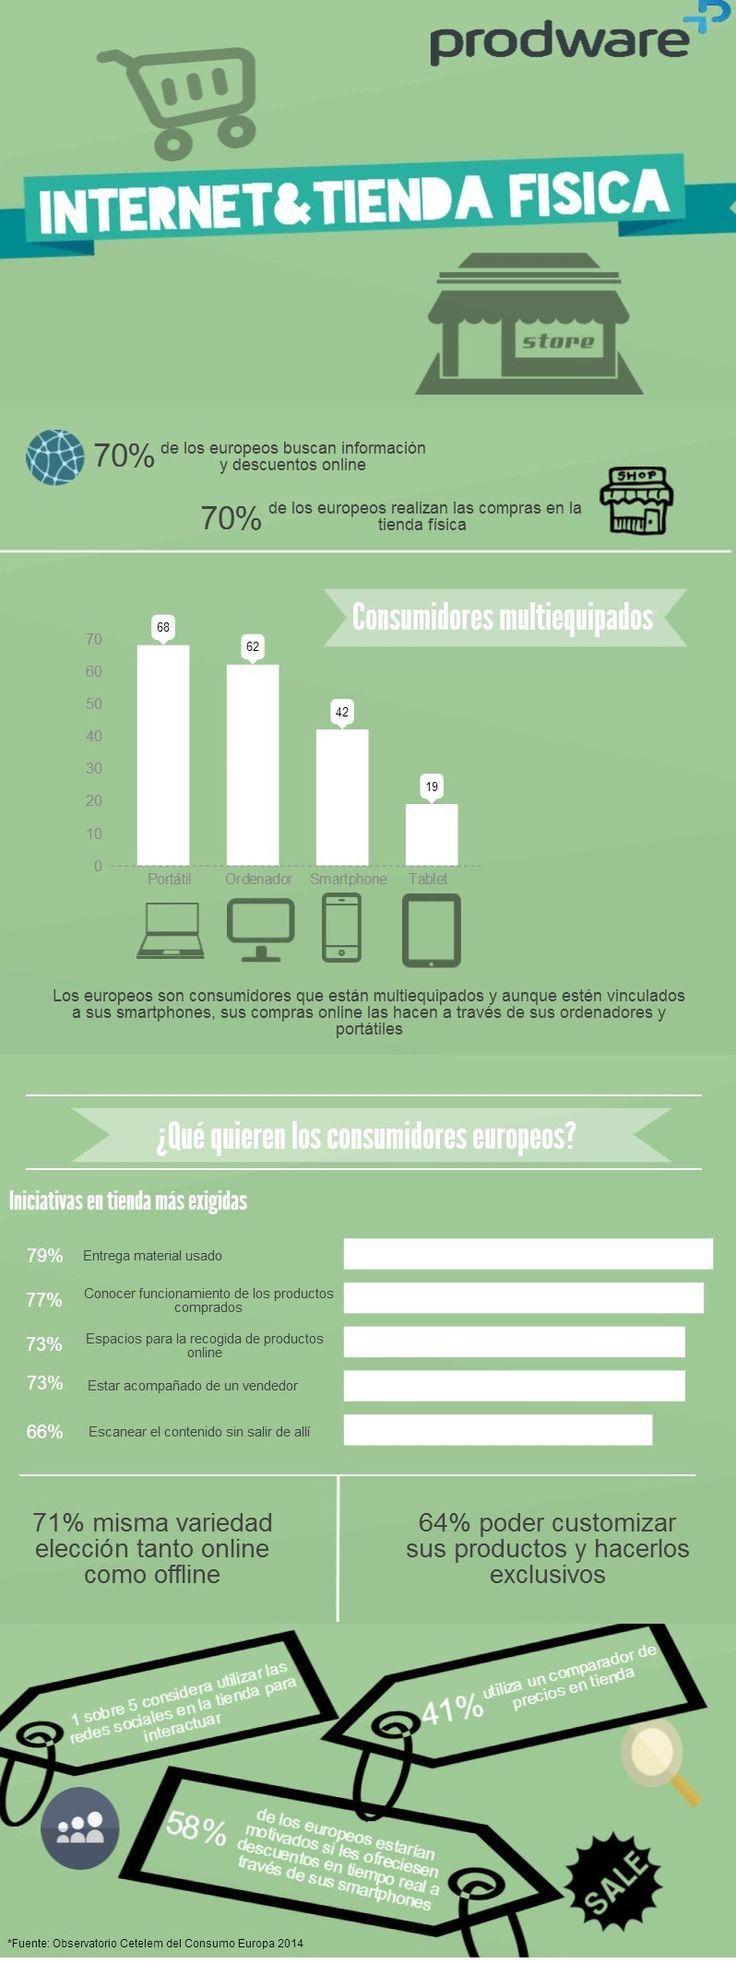 Internet y la tienda física #infografia #infographic #marketing